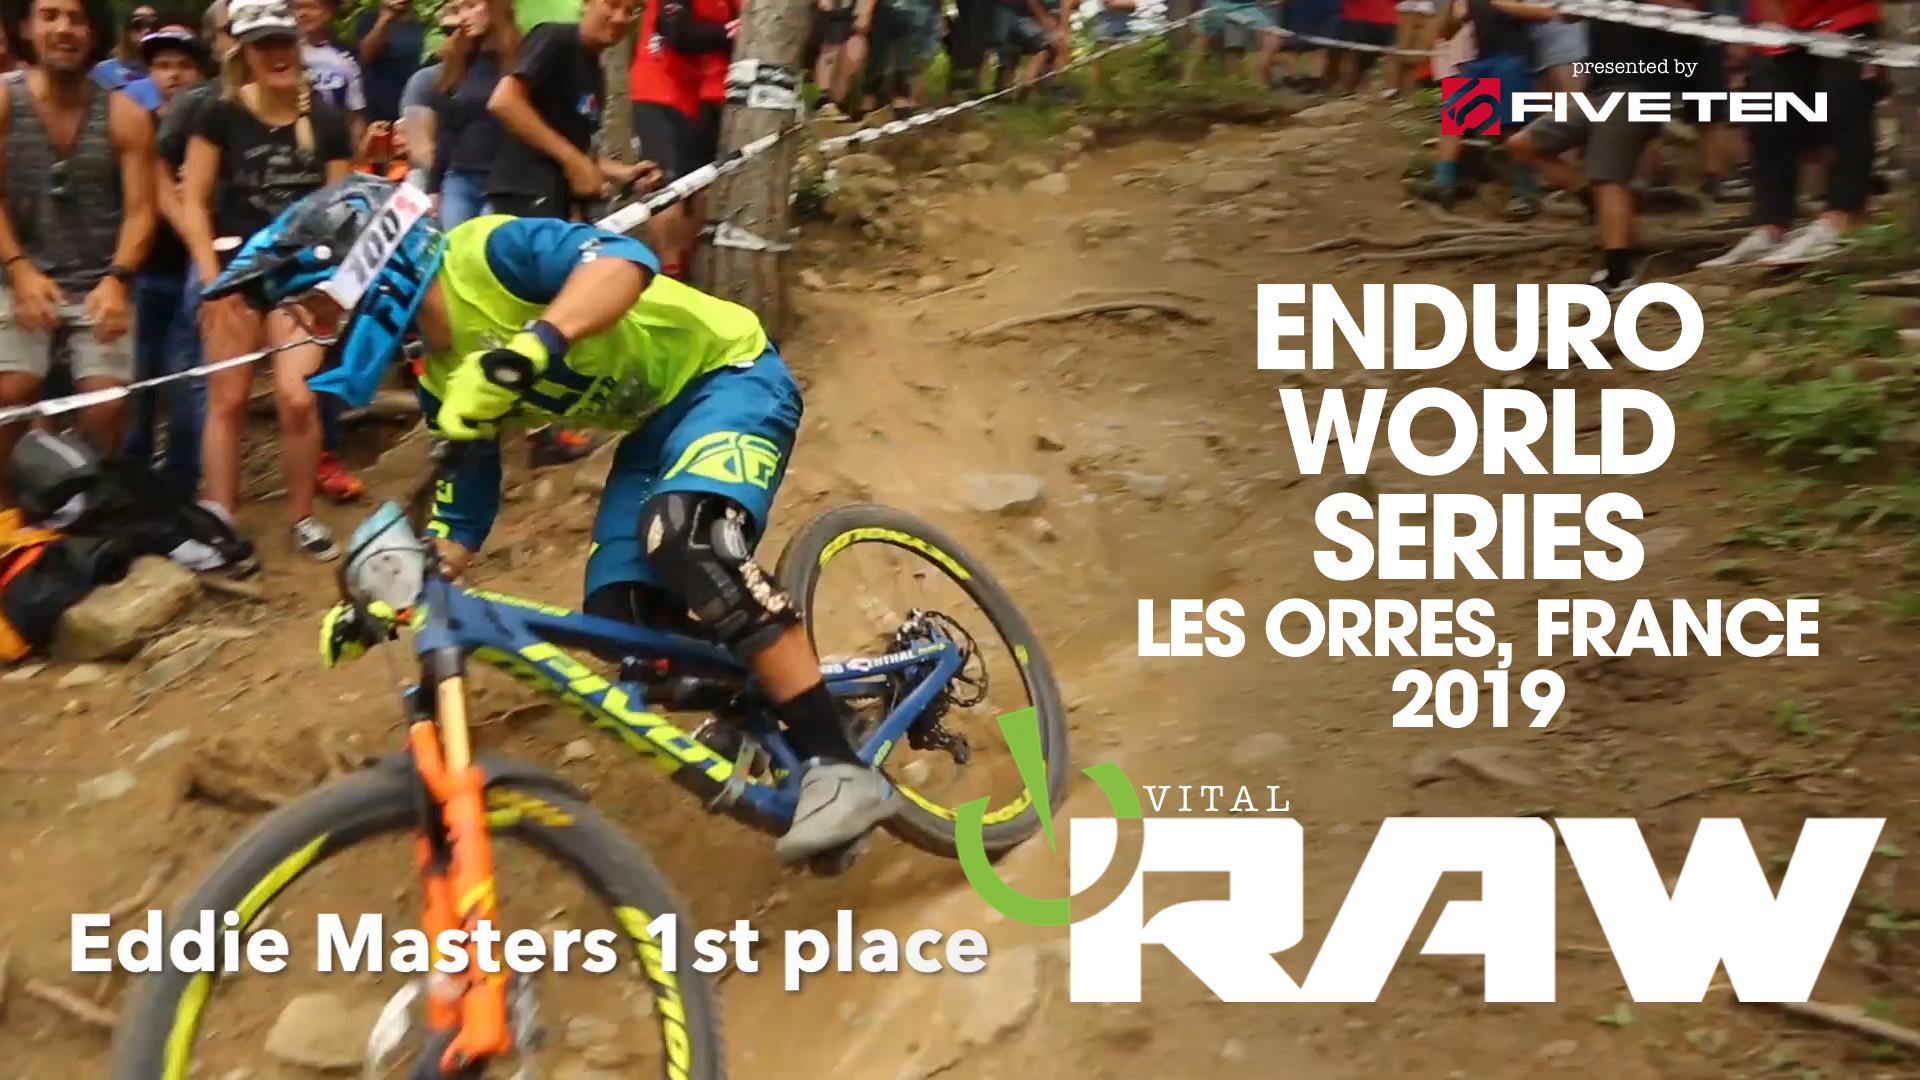 Vital RAW - Enduro World Series 2019 Les Orres, France - EDDIE WINS!